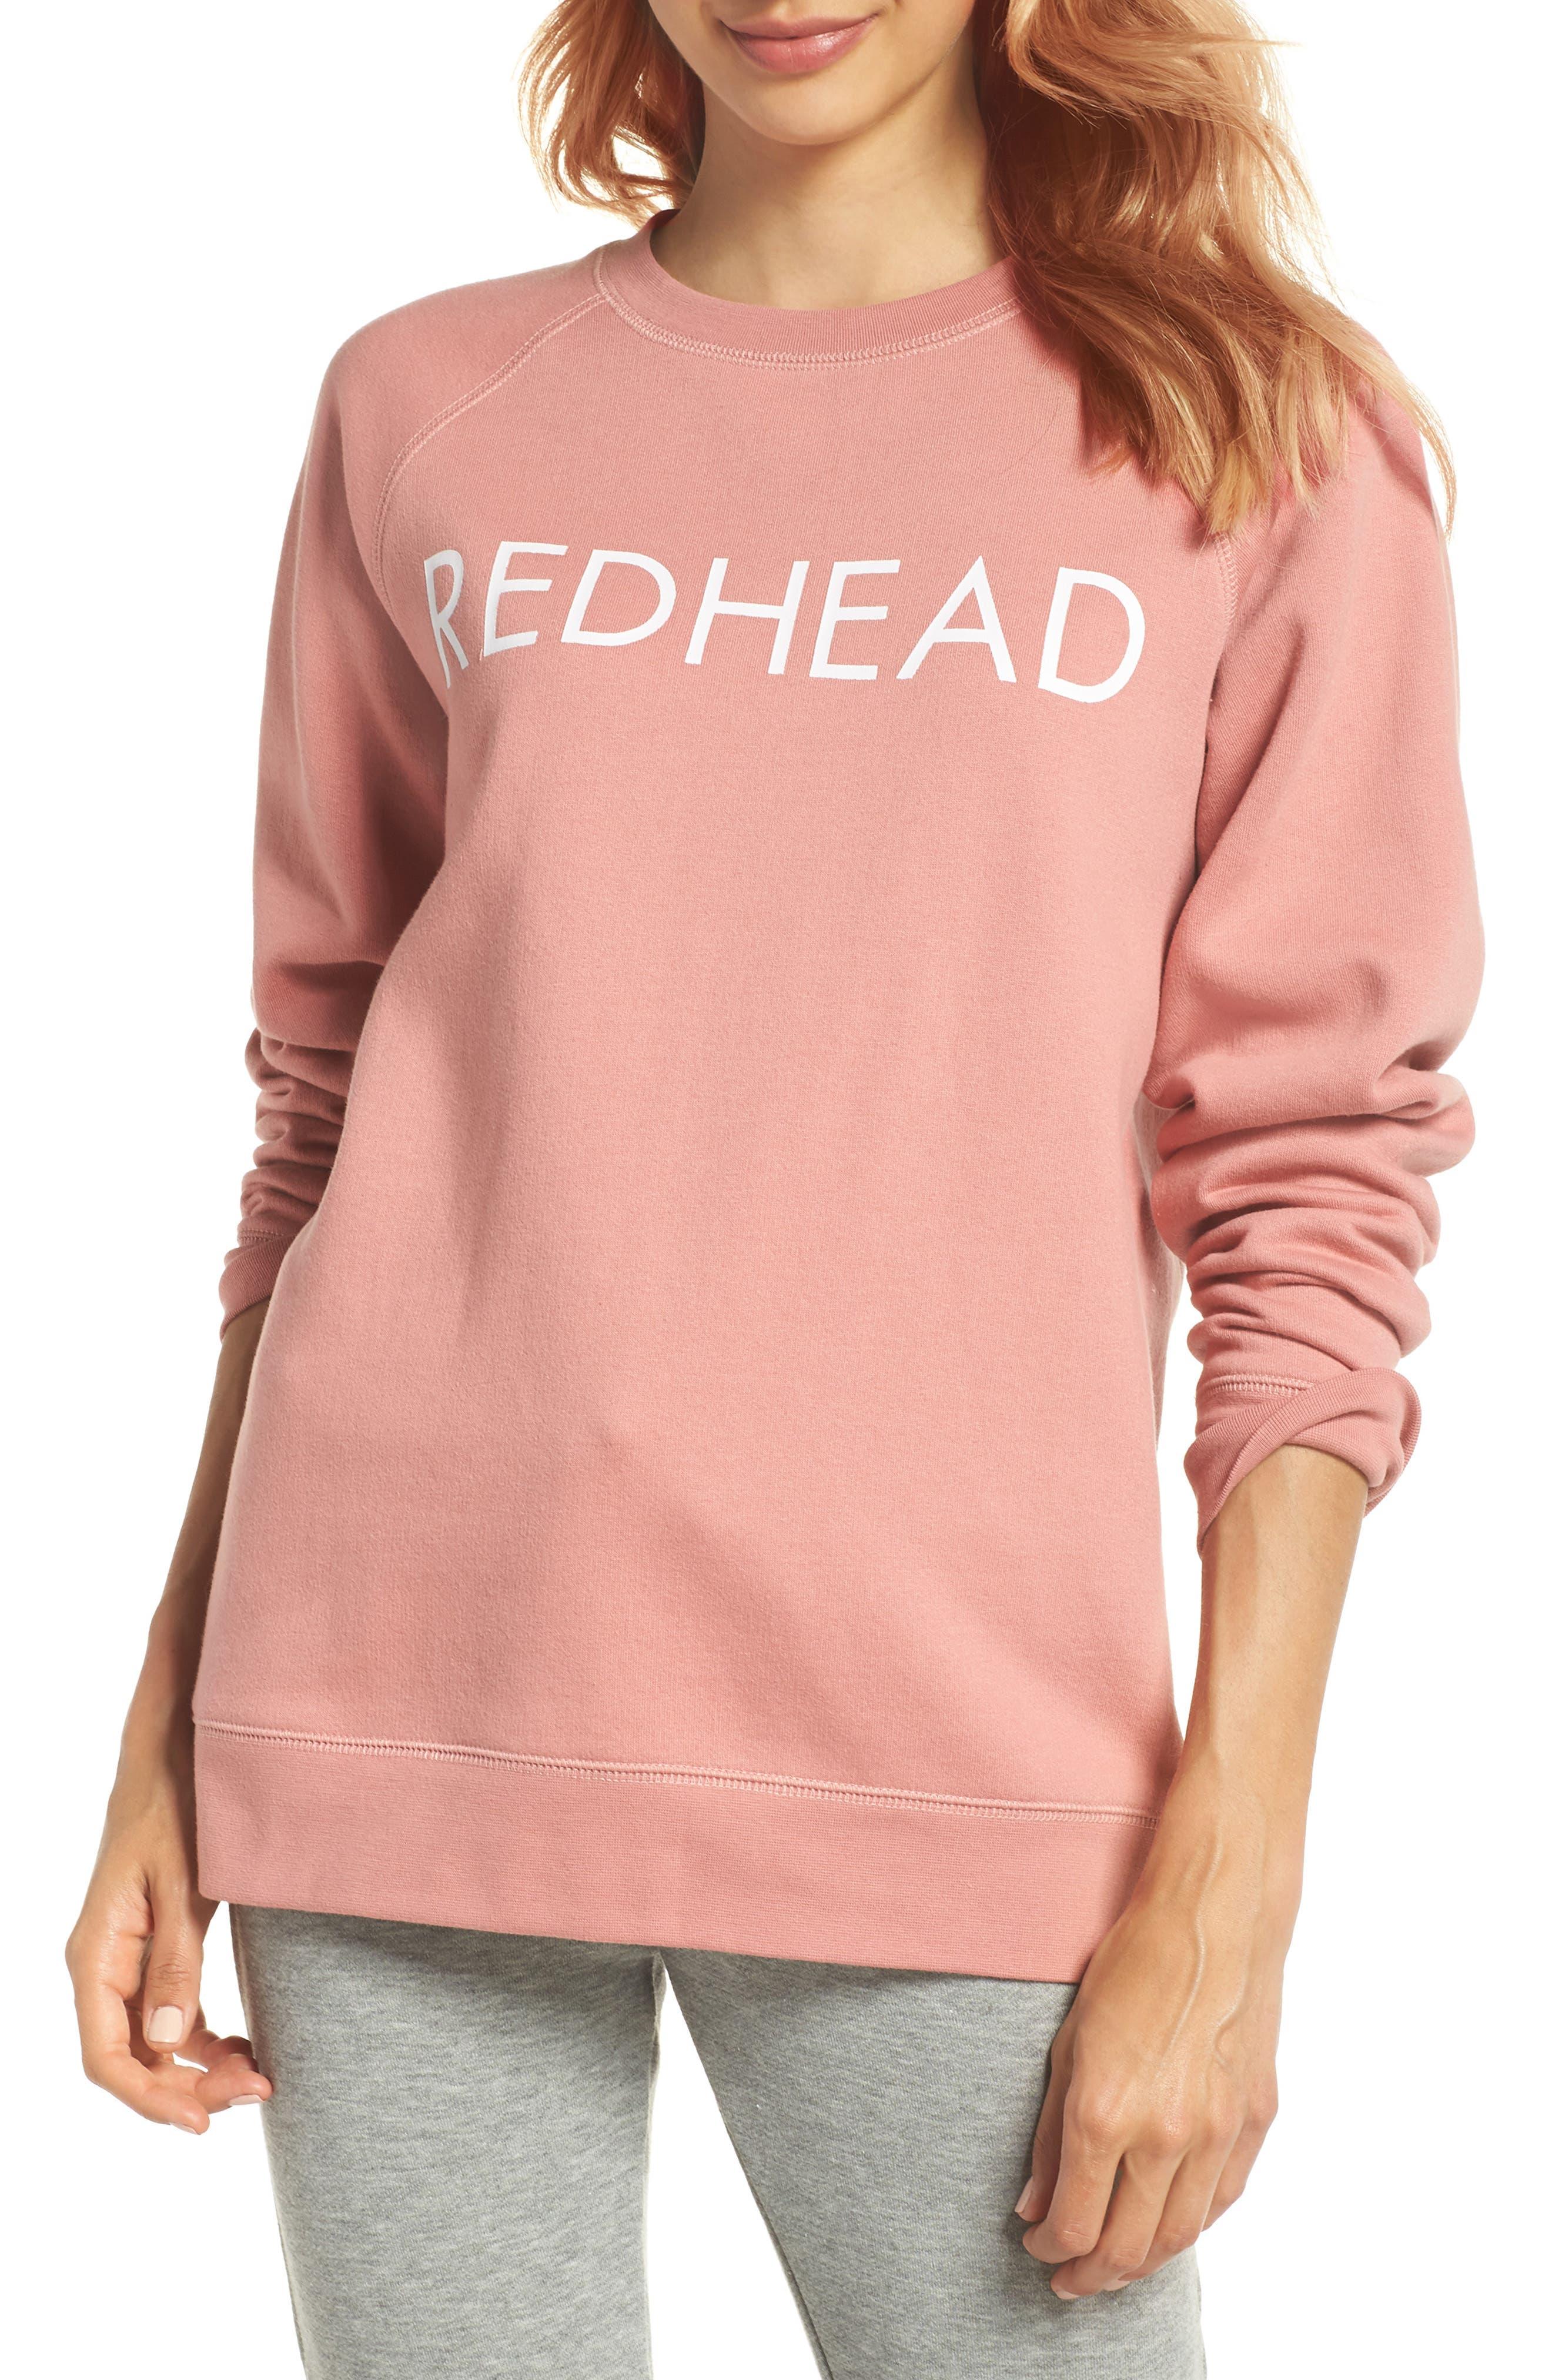 BRUNETTE THE LABEL,                             Redhead Crewneck Sweatshirt,                             Main thumbnail 1, color,                             951